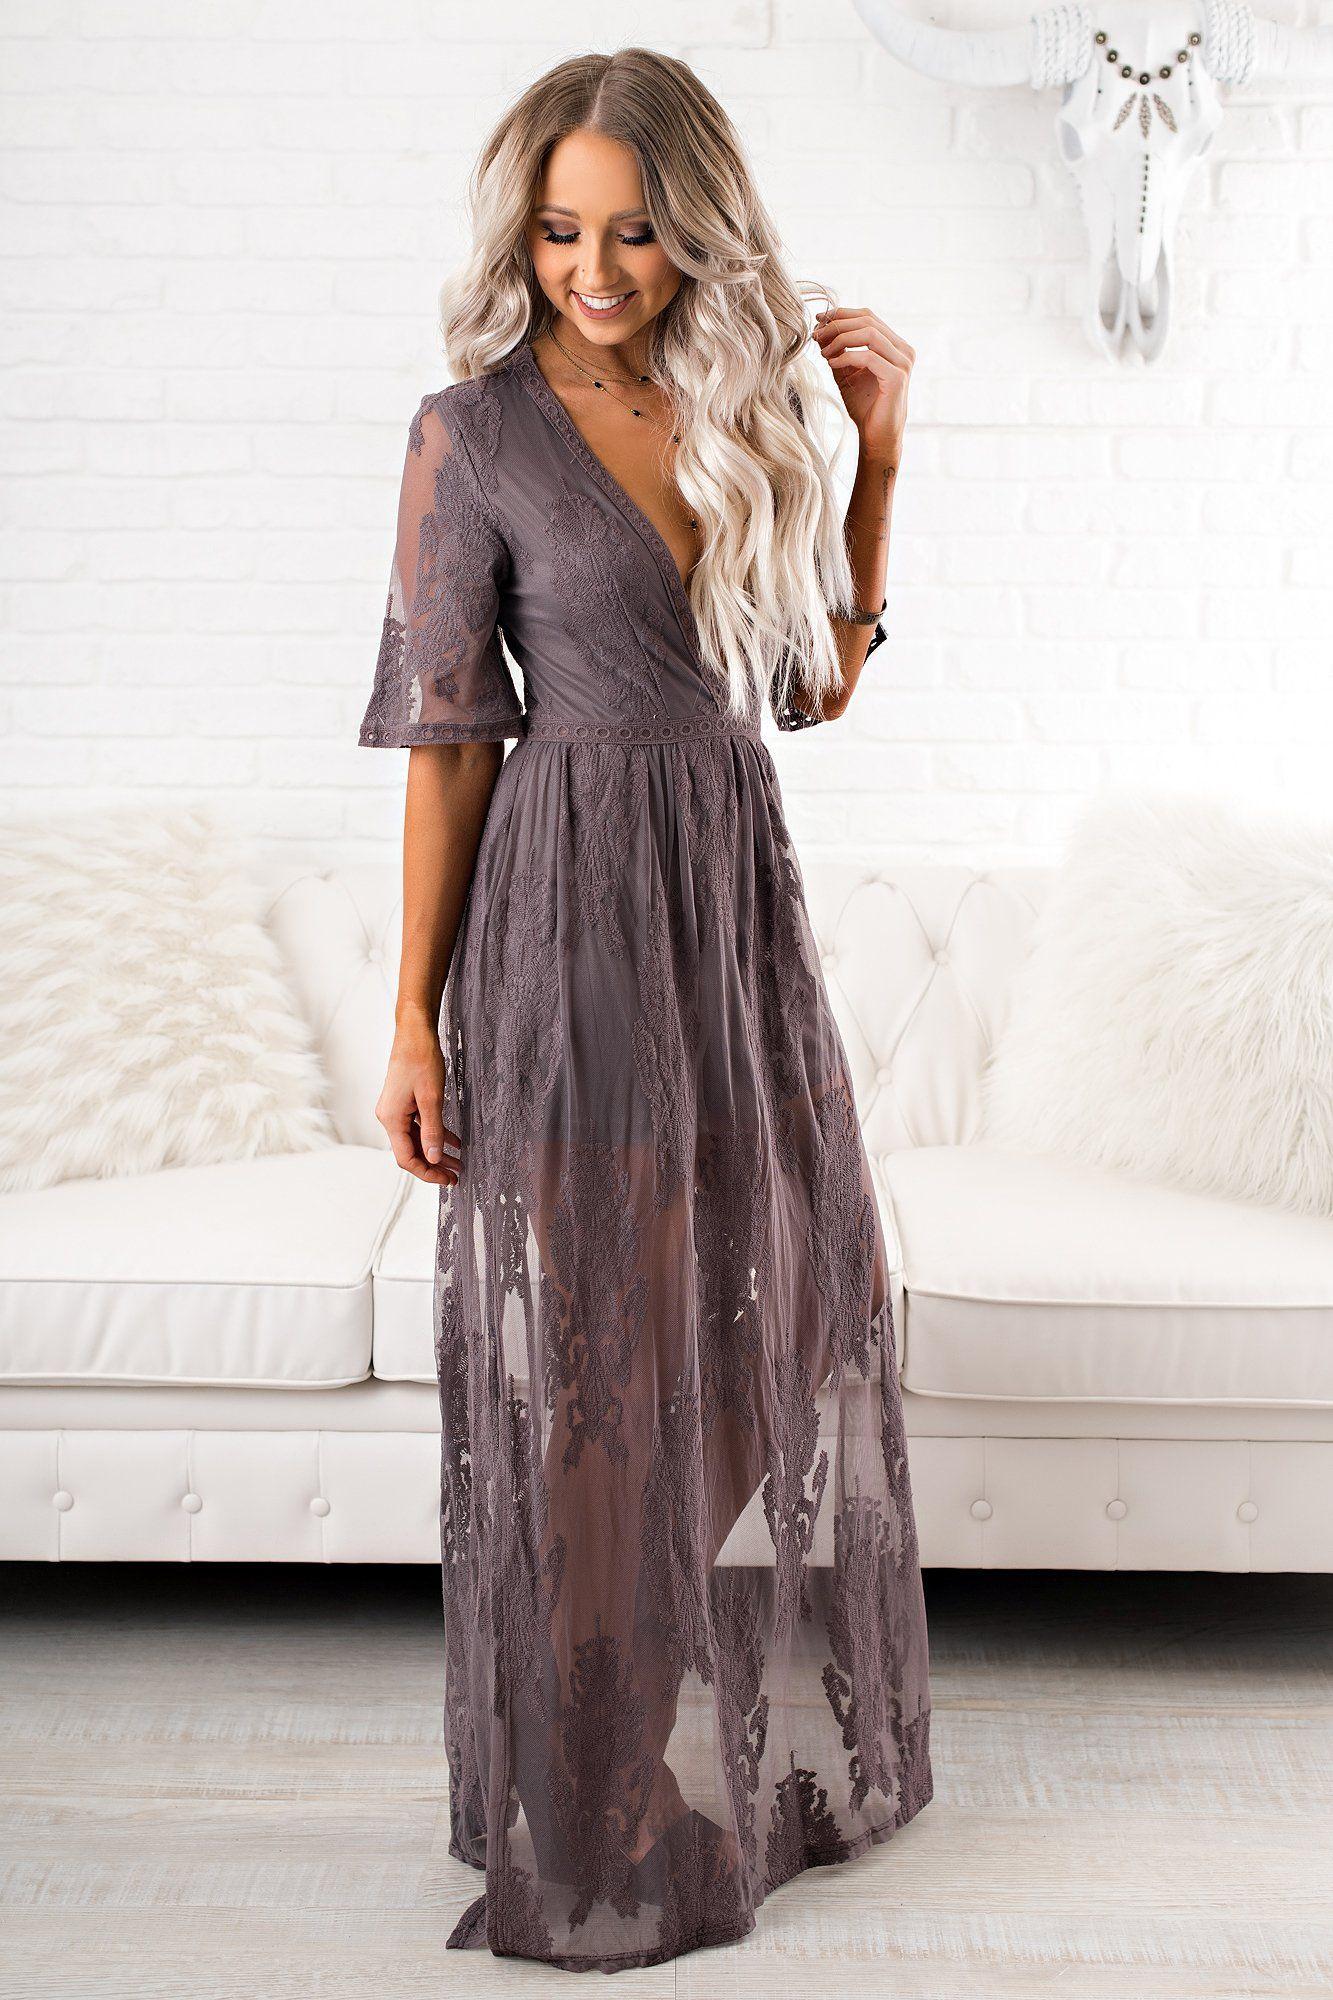 44++ Bohemian chic wedding guest dress ideas in 2021